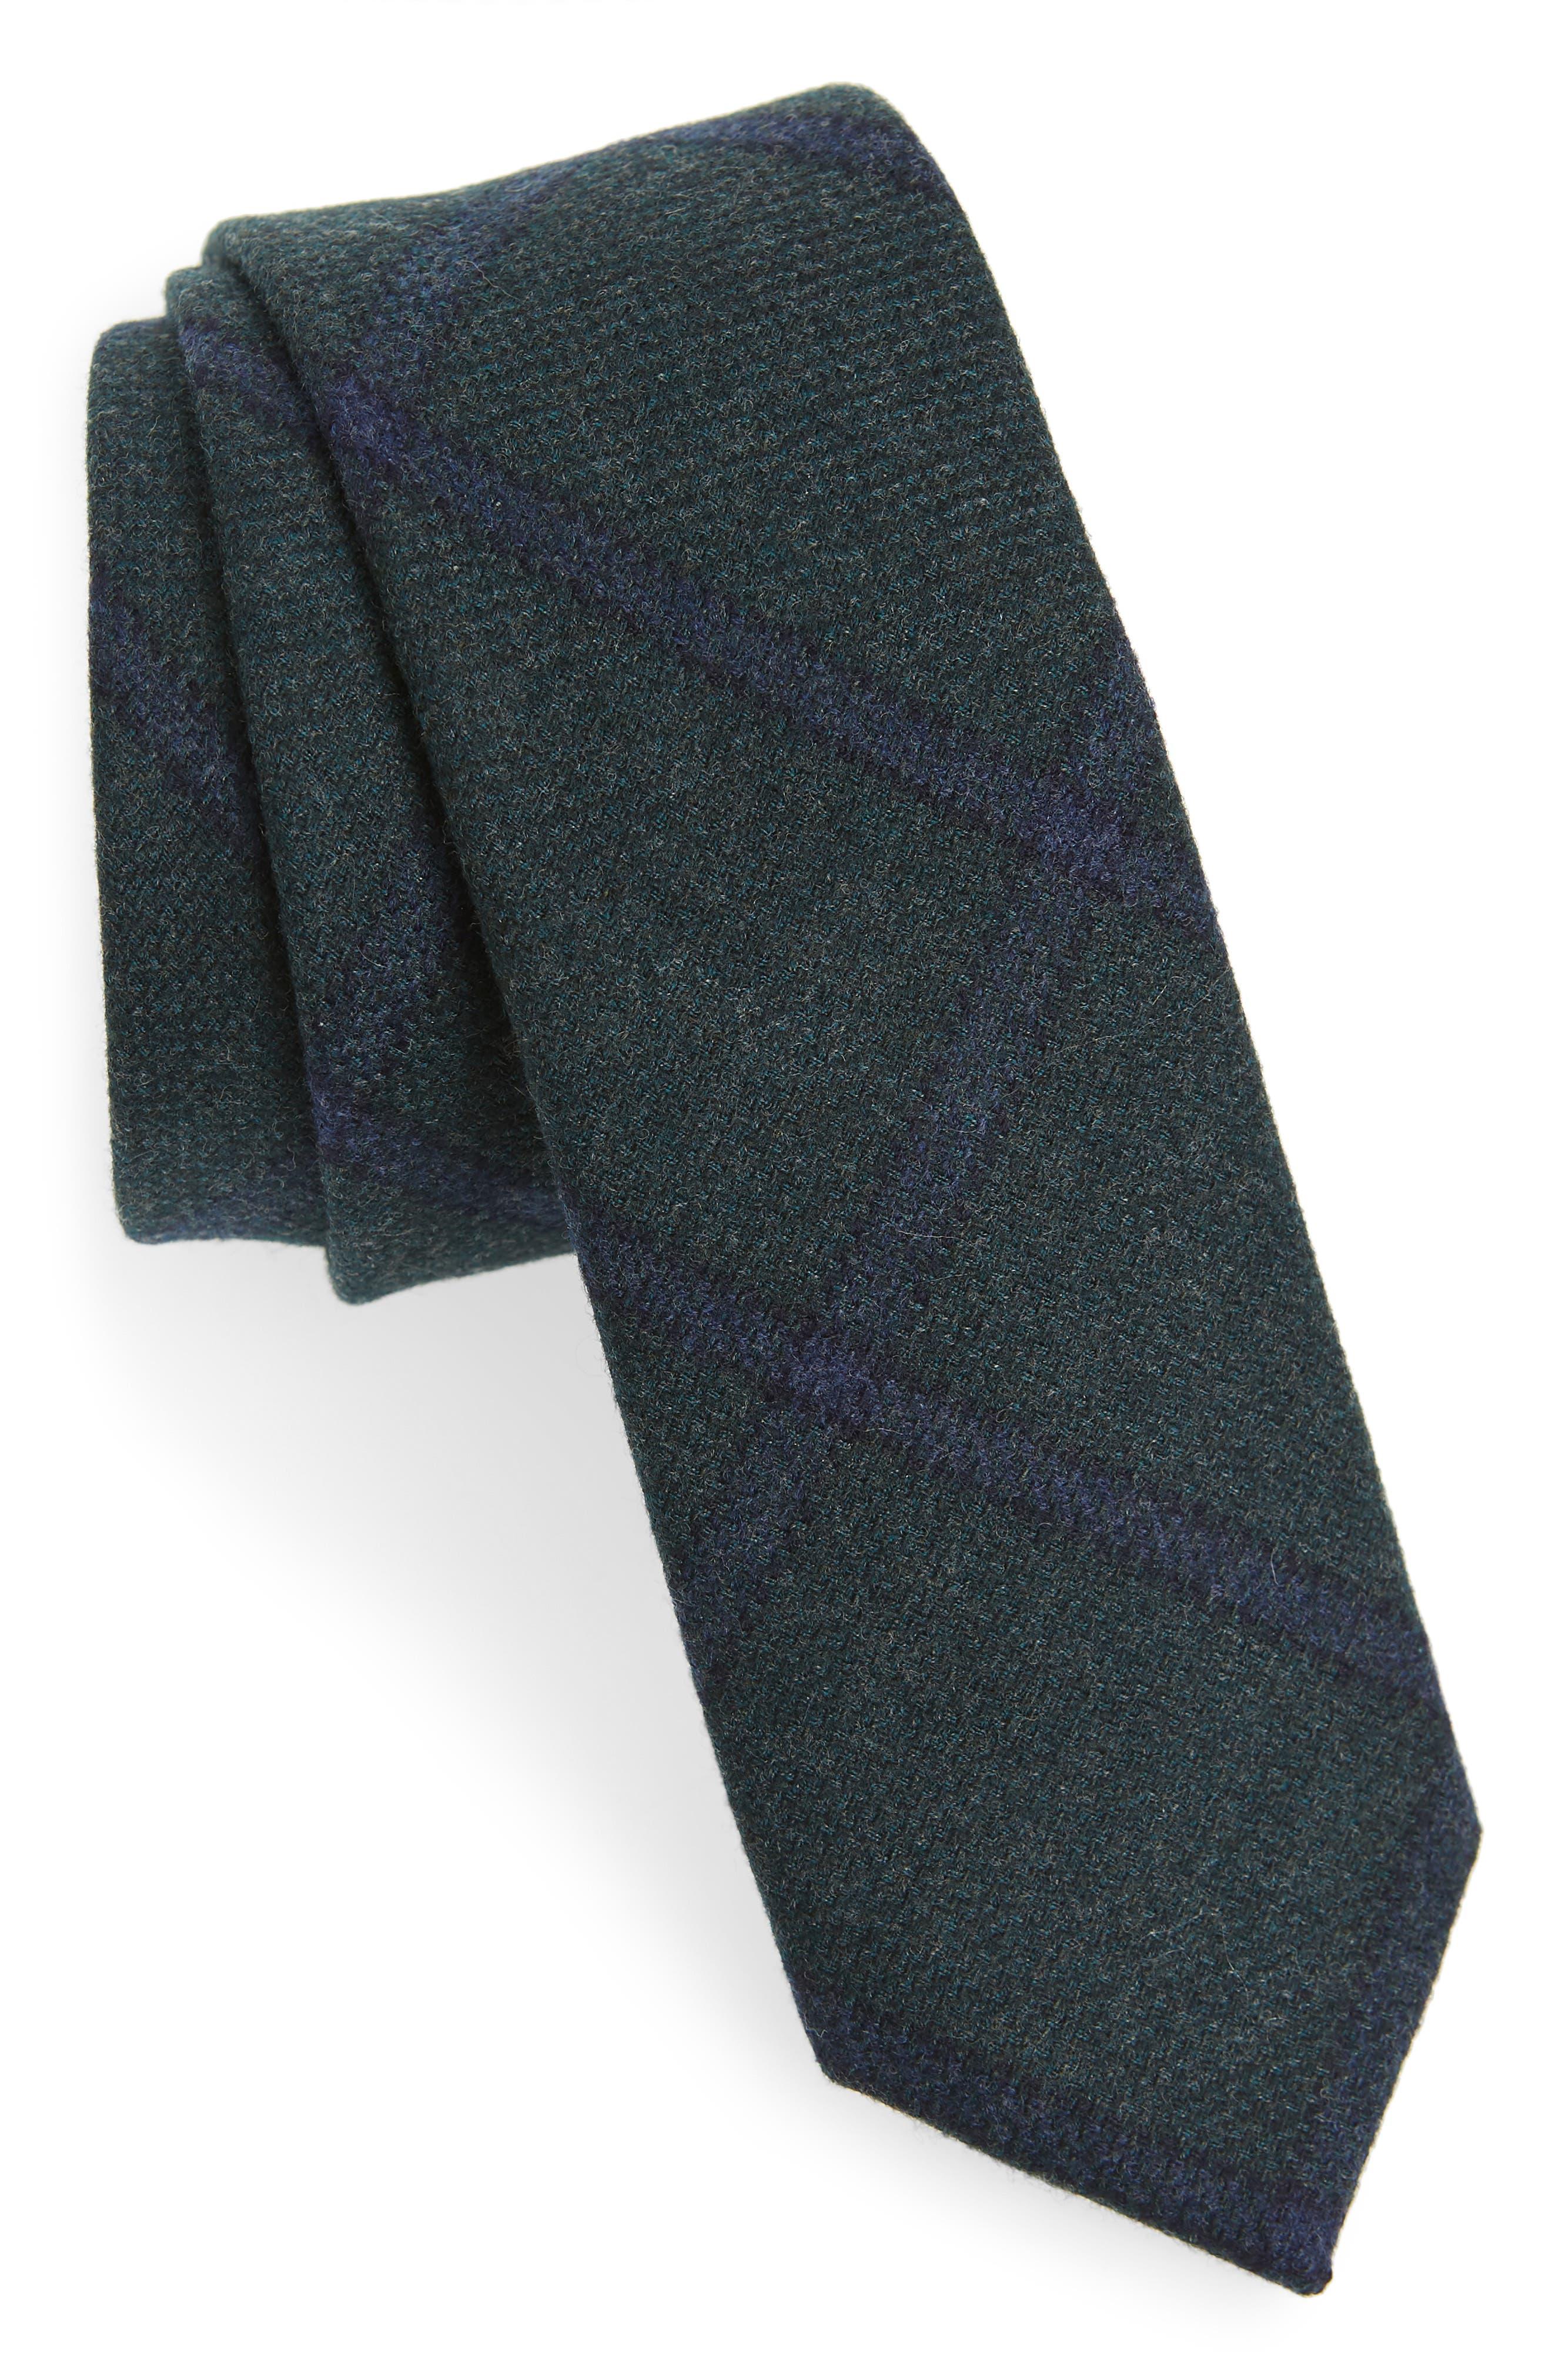 New 1930s Mens Fashion Ties Mens The Tie Bar Scoldo Plaid Wool Tie $23.45 AT vintagedancer.com